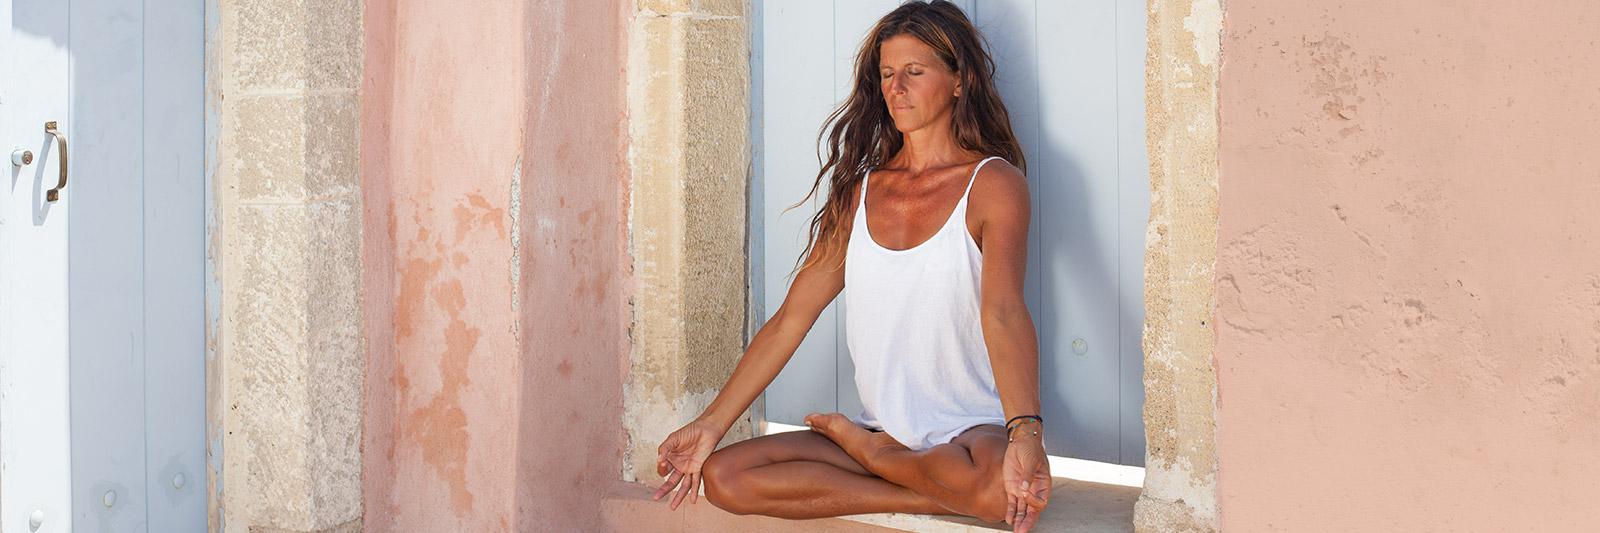 Gloria Latham meditating in a greek style house